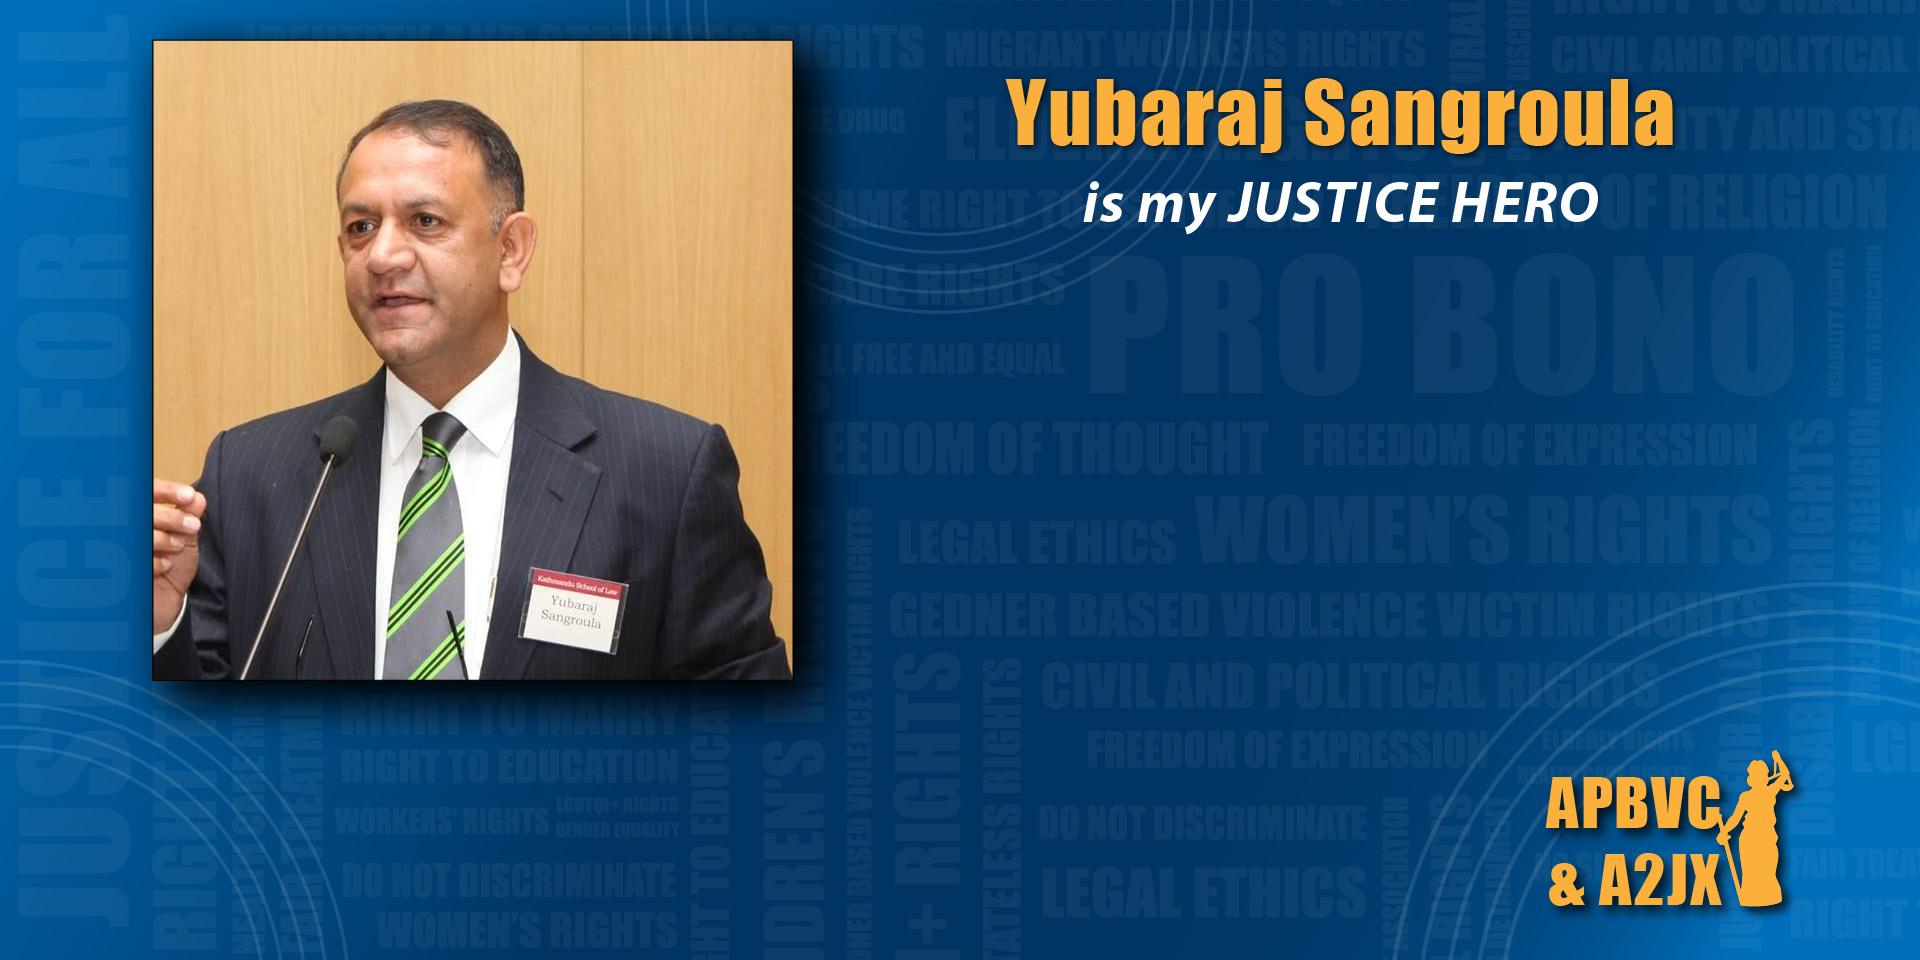 Yubaraj Sangroula